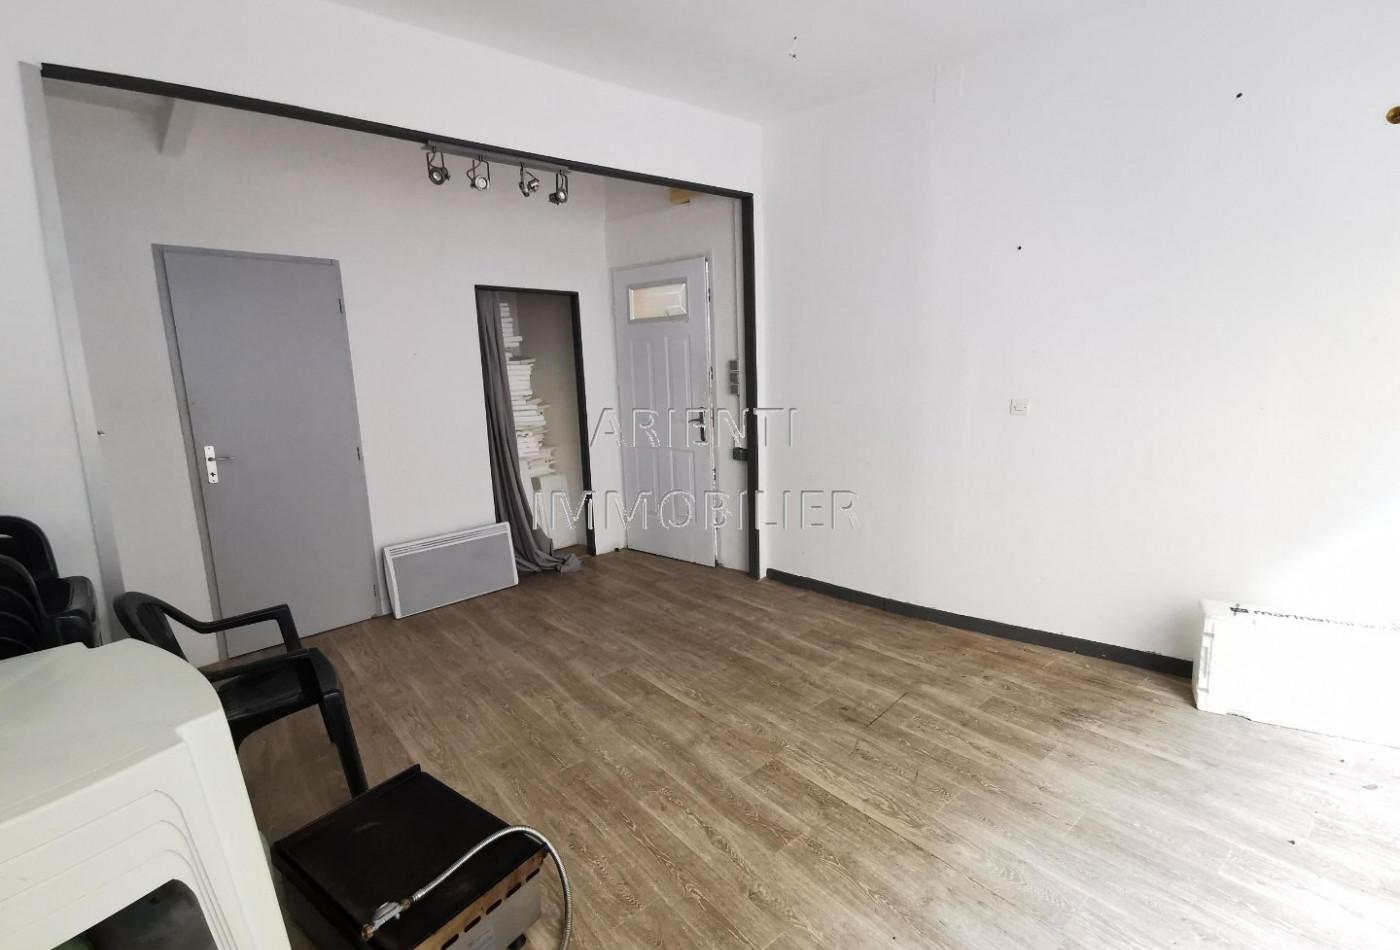 A vendre  Valreas | Réf 260013206 - Office immobilier arienti